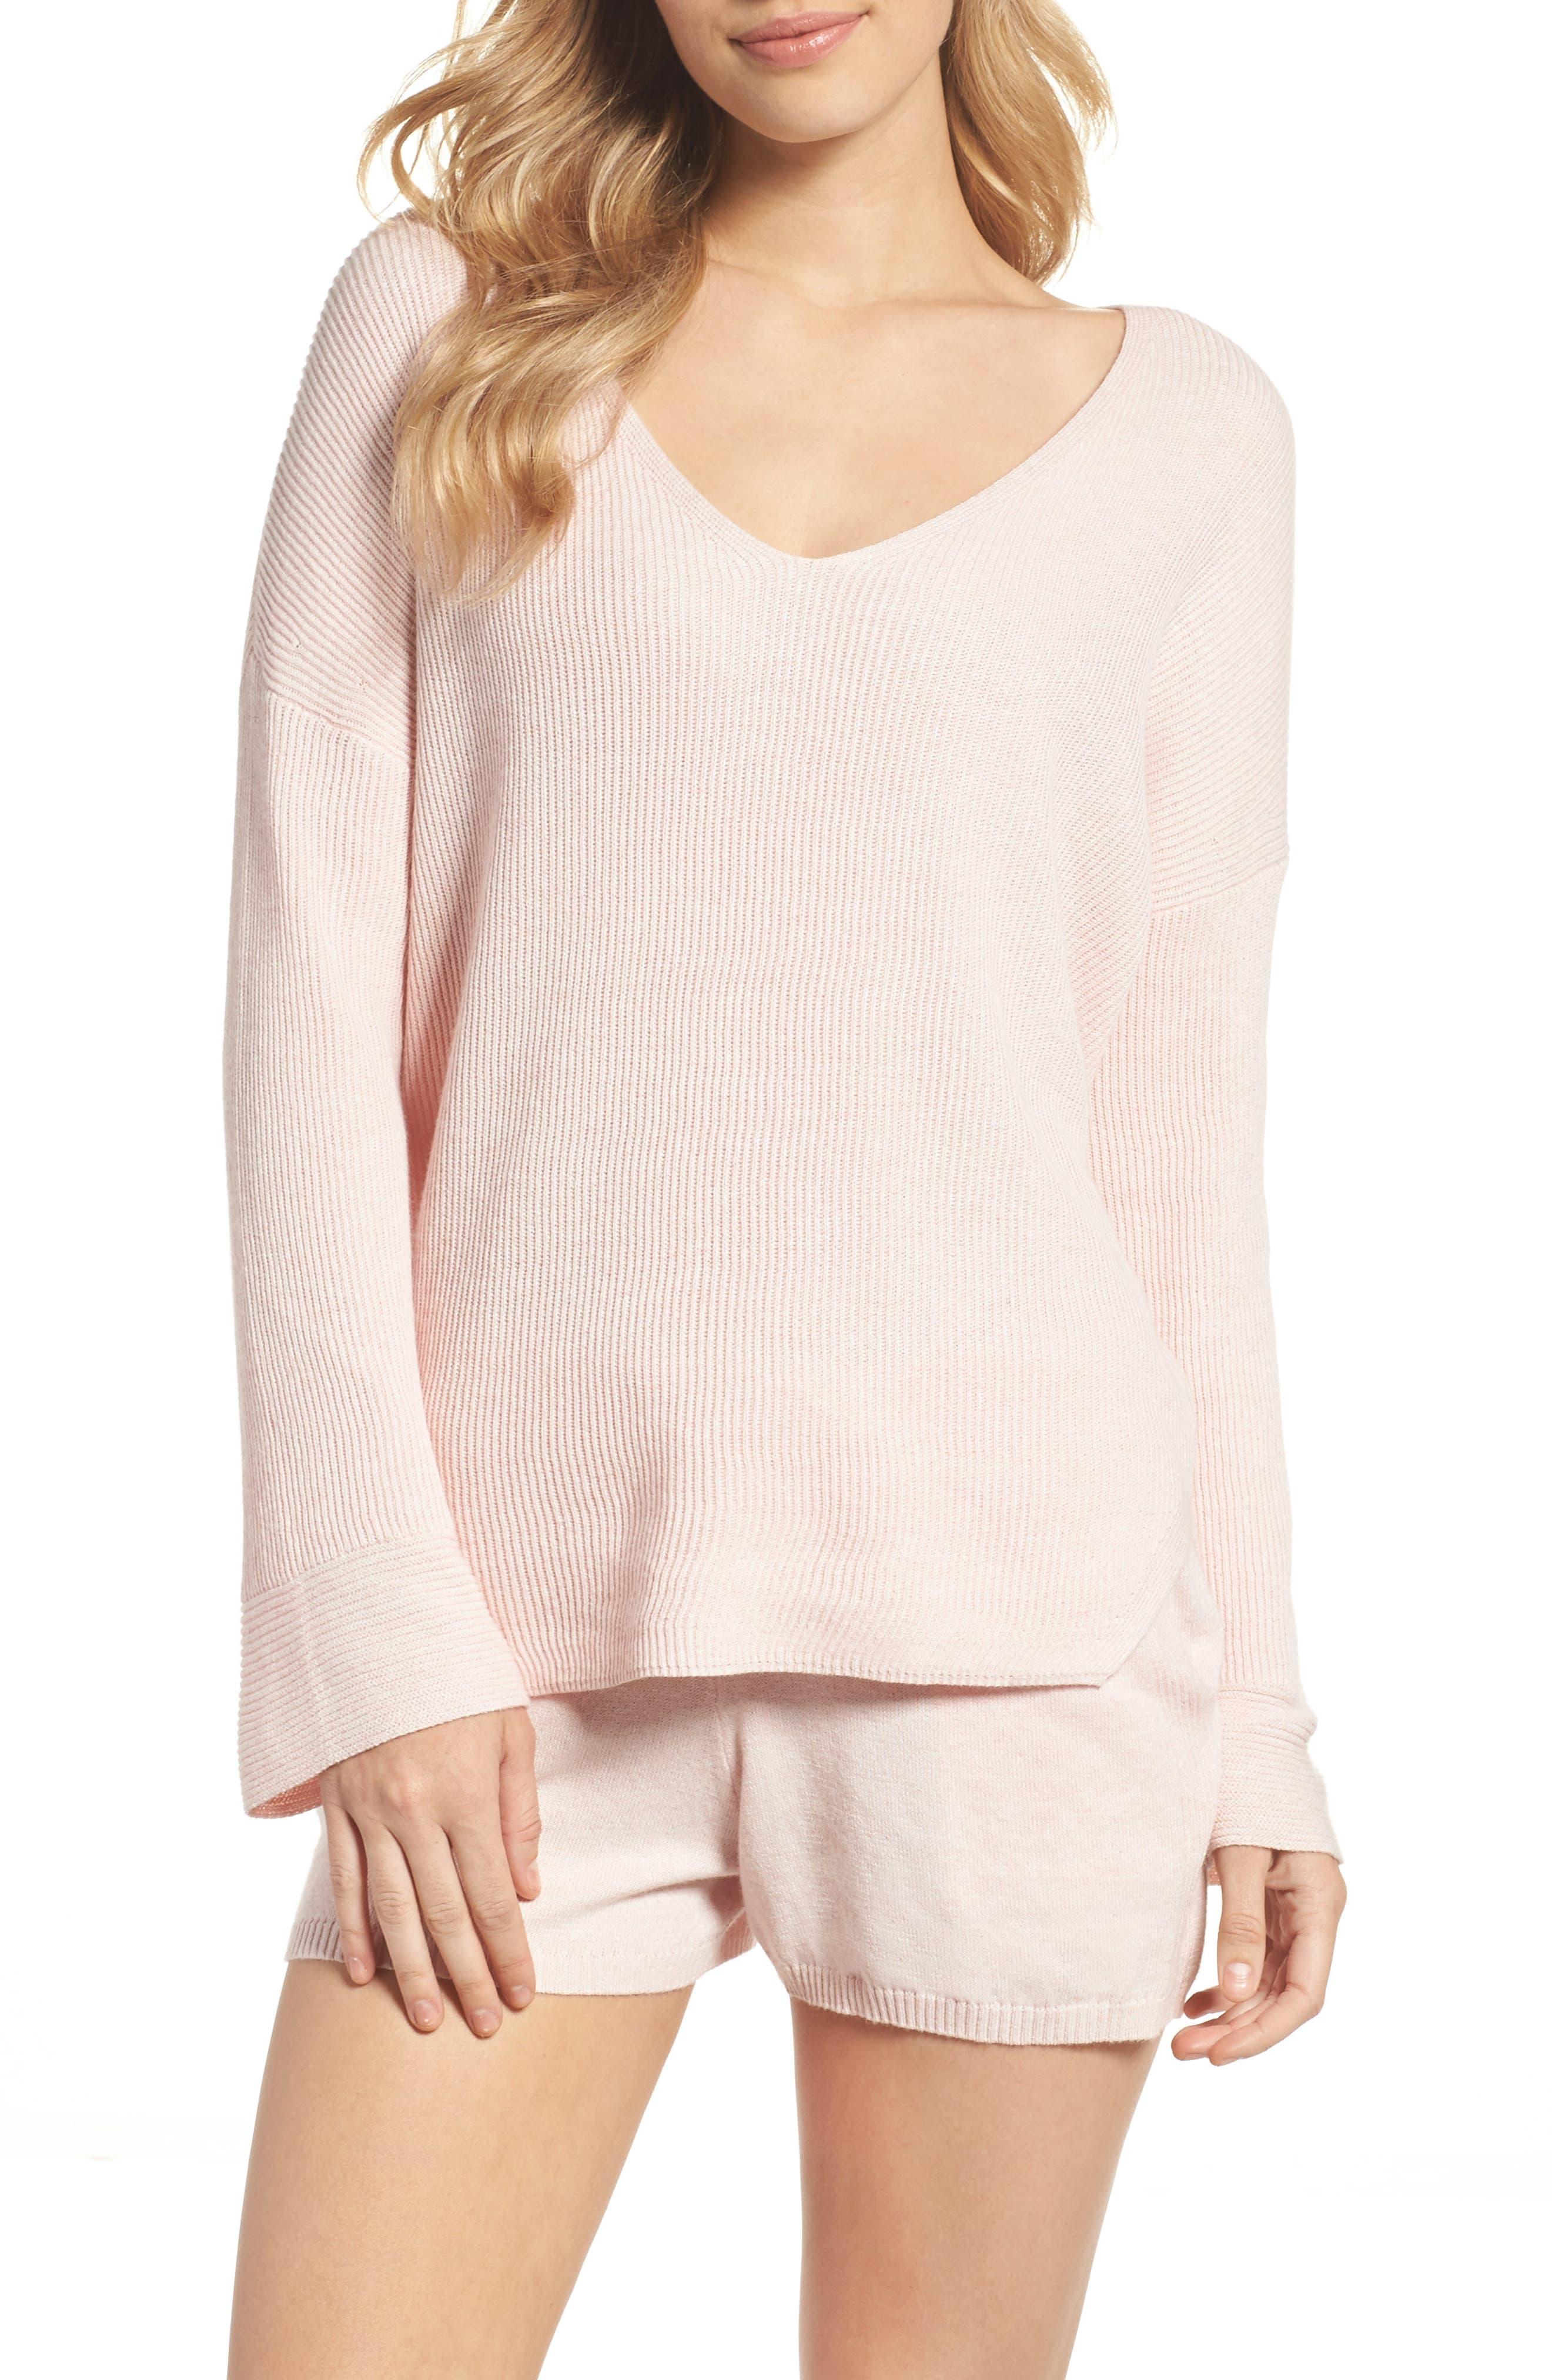 Vic Lounge Shorts,                             Alternate thumbnail 5, color,                             Soft Pink